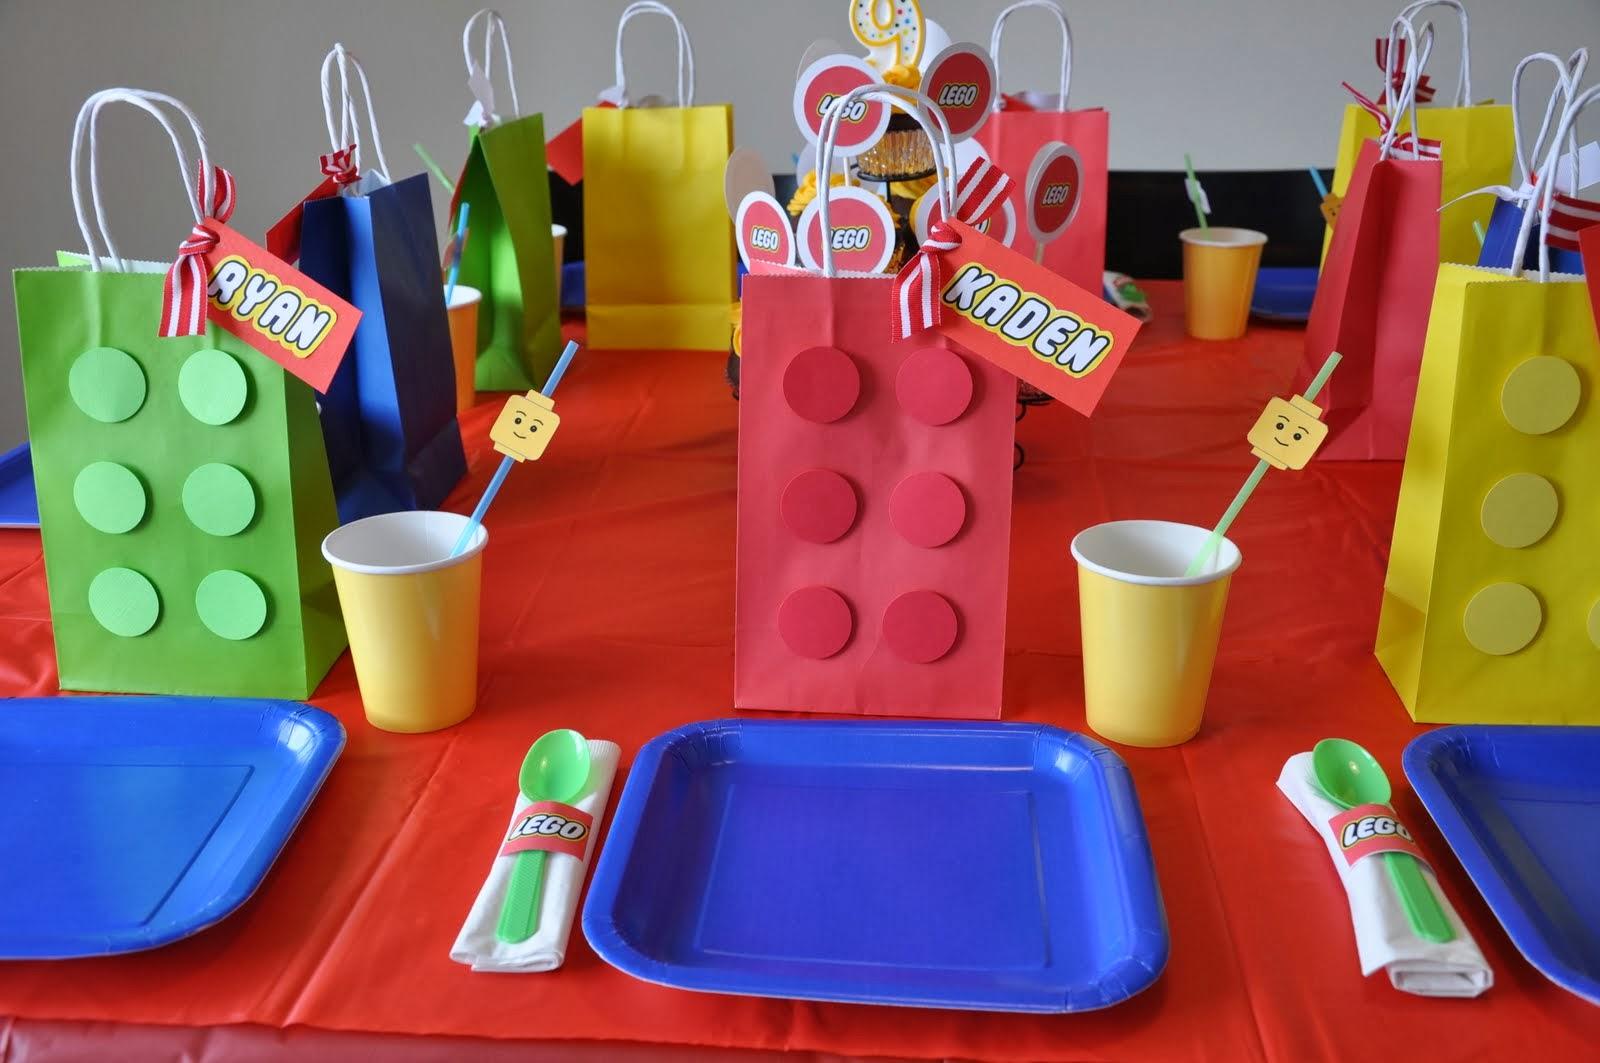 Decoraci n de mesa de fiesta de lego ideas y material for Decoracion infantil barata